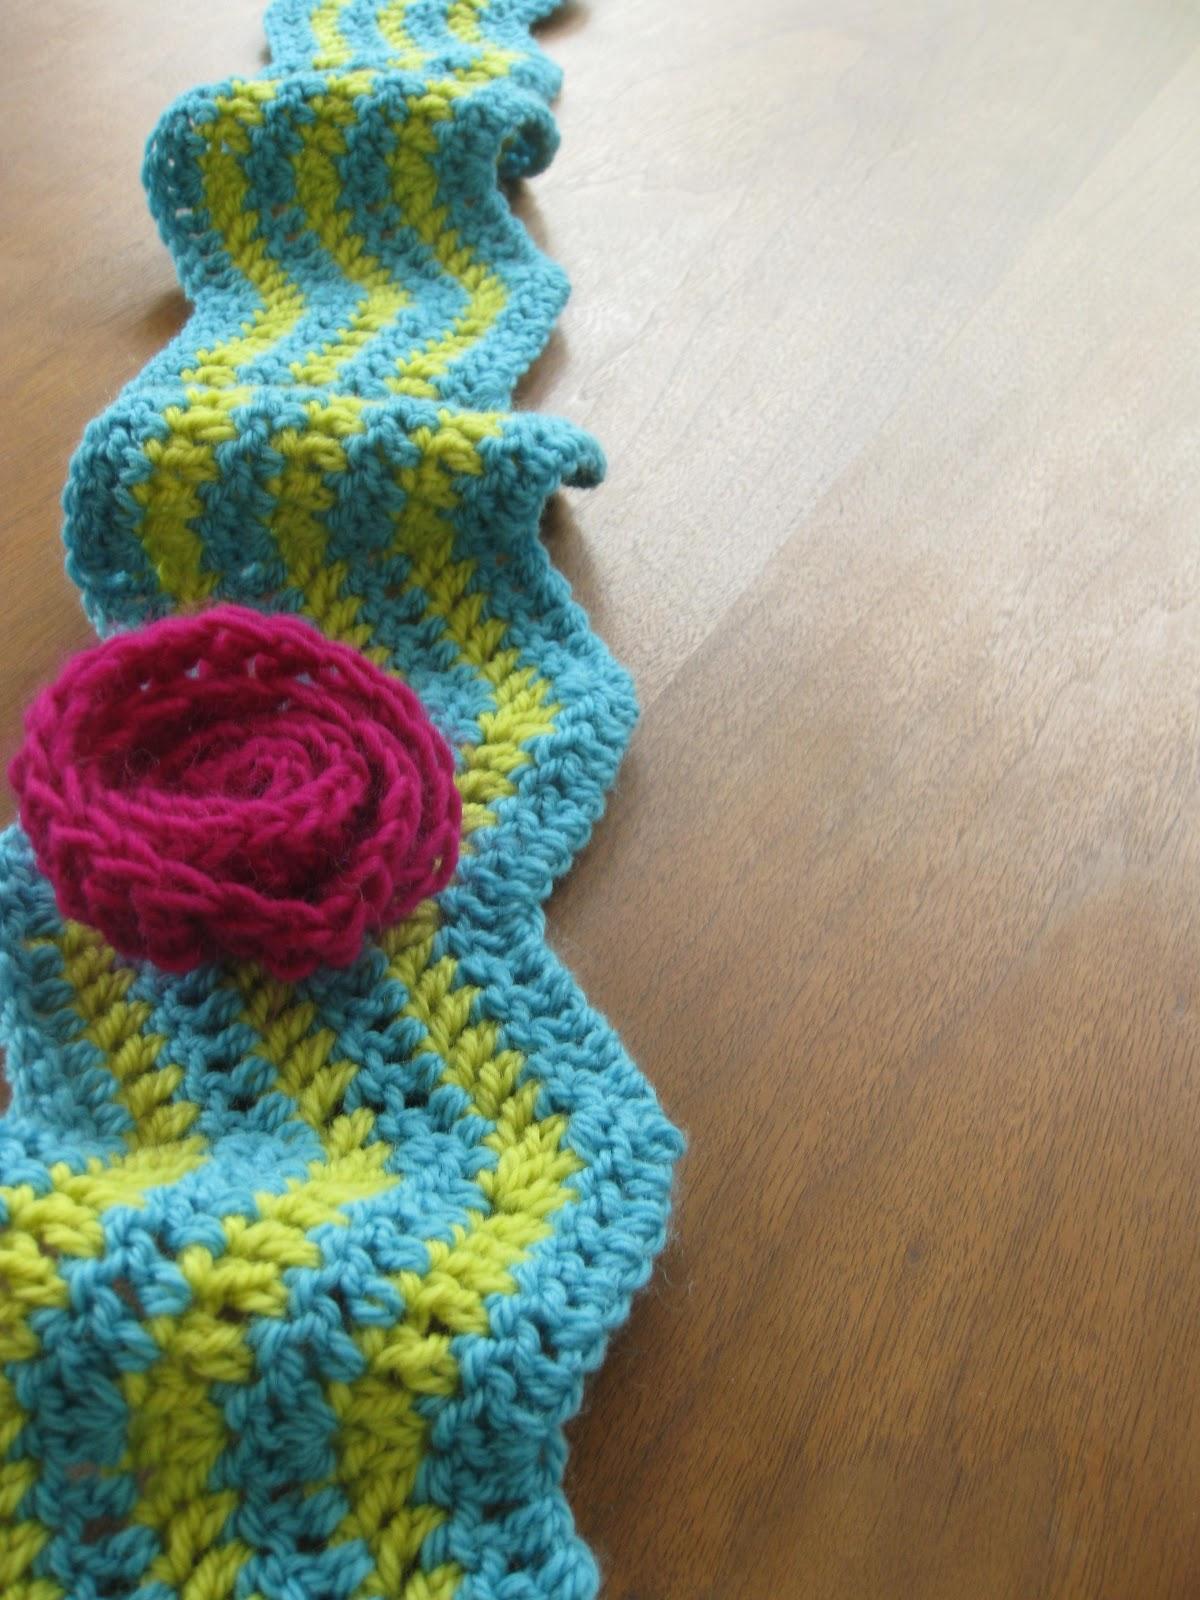 Crochet Classes : alipyper: Intro to Crochet class added at Harmony